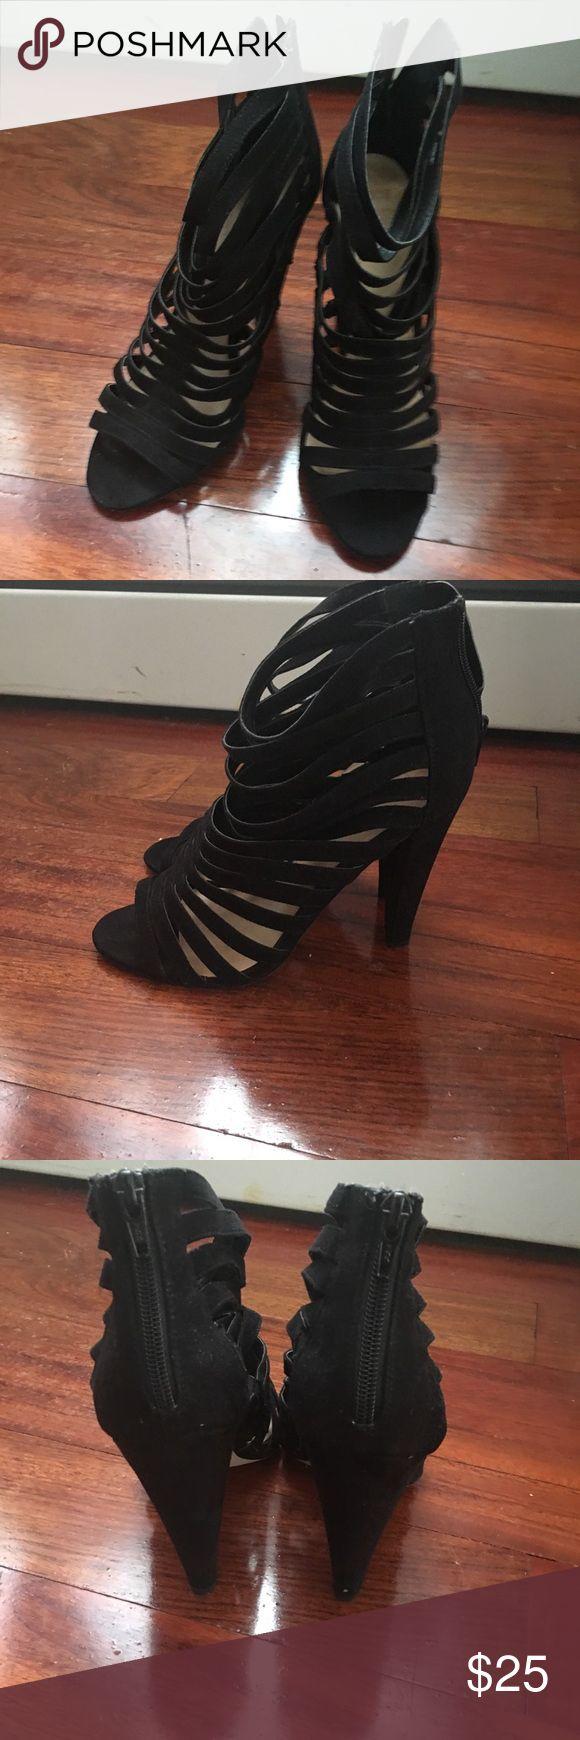 ASOS Black Heeled sandals Sexy Black caged heel sandals ASOS Shoes Sandals